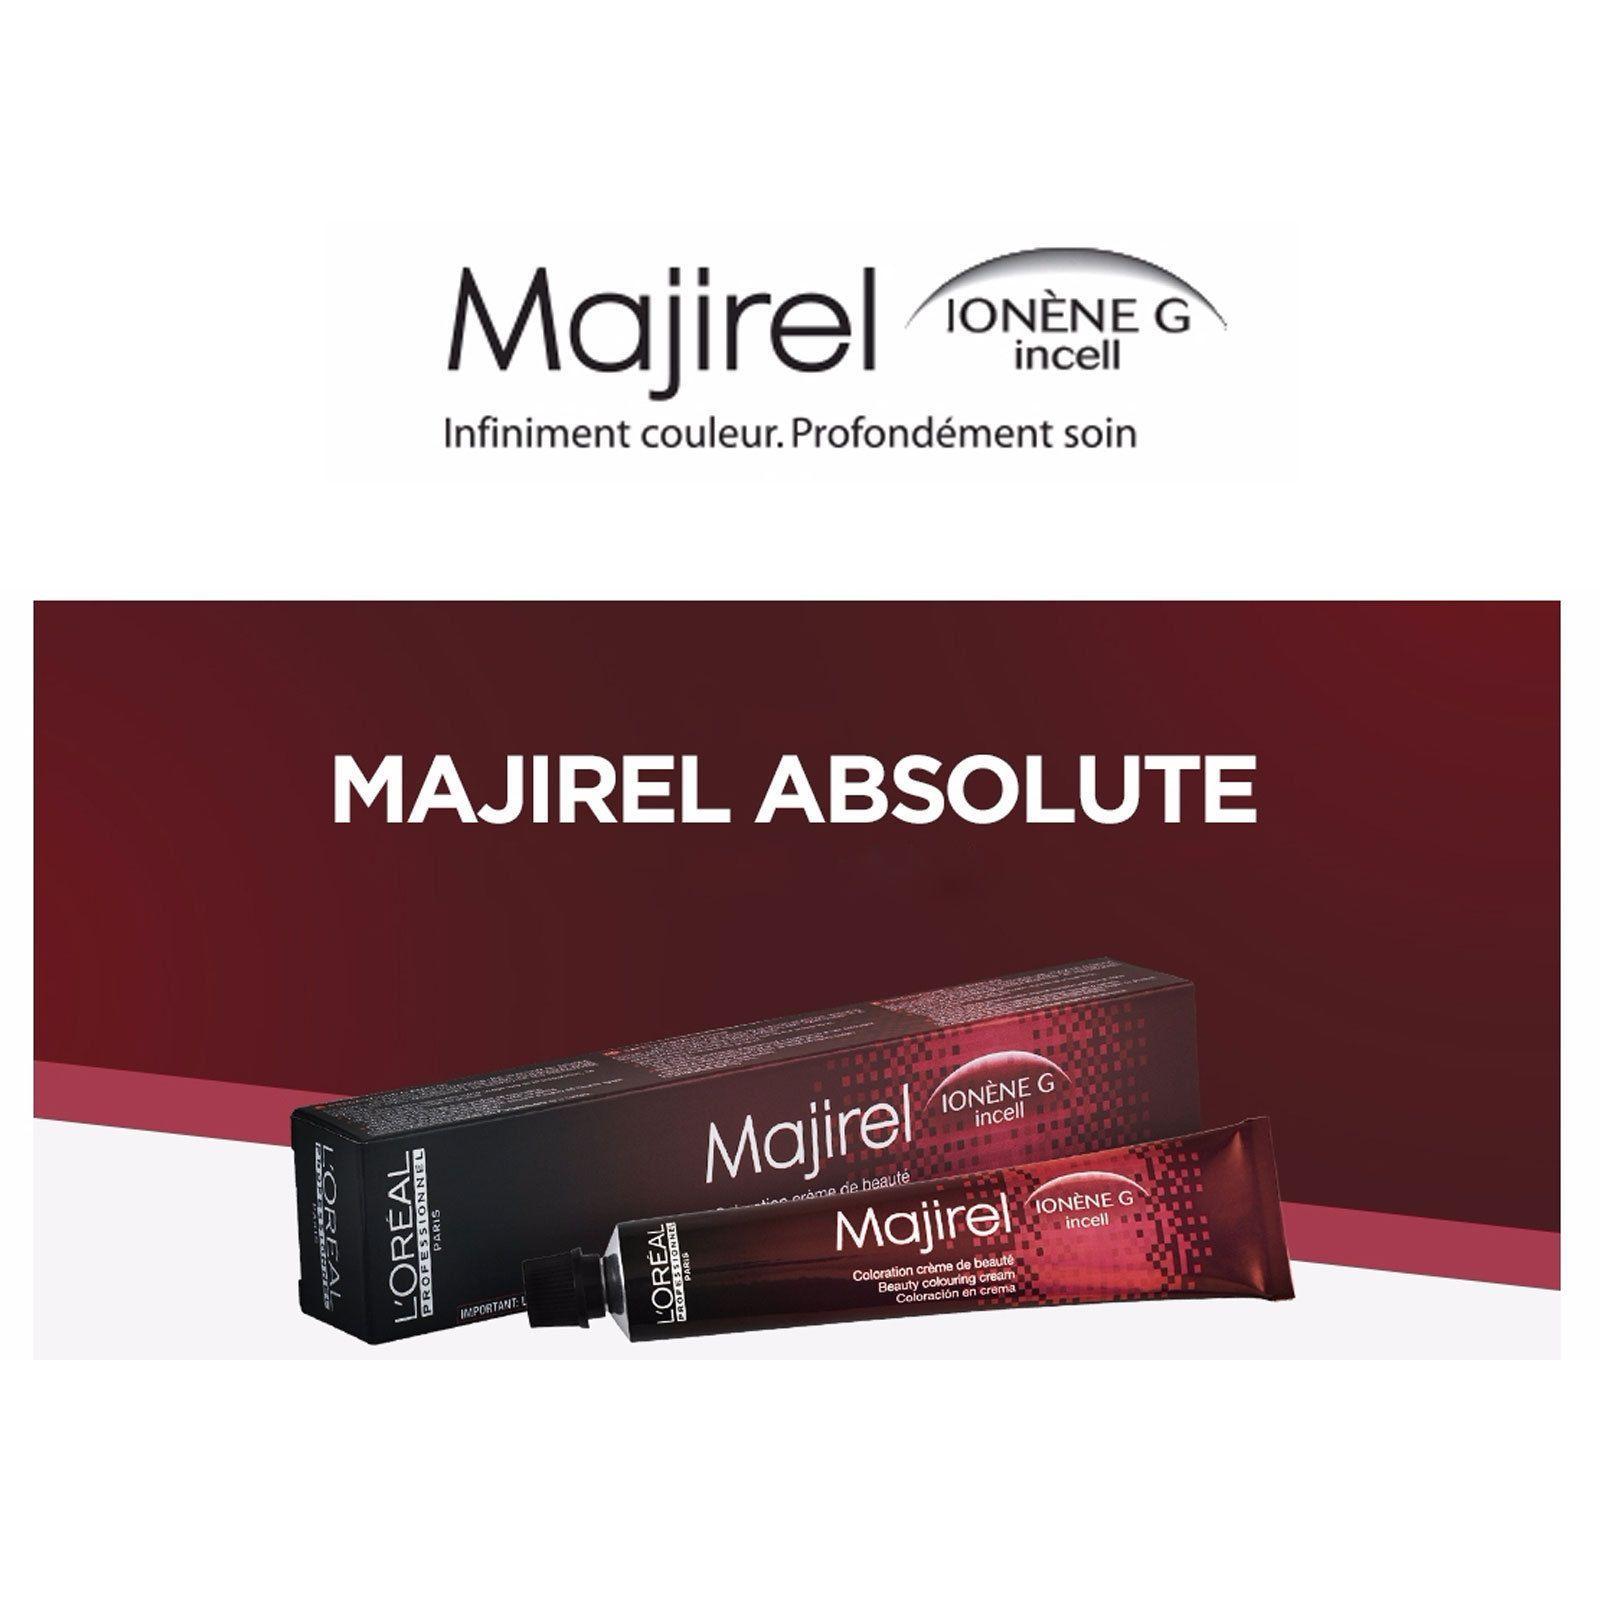 Loreal Majirel Hair Dye Permanent Beauty Coloring Cream Professional